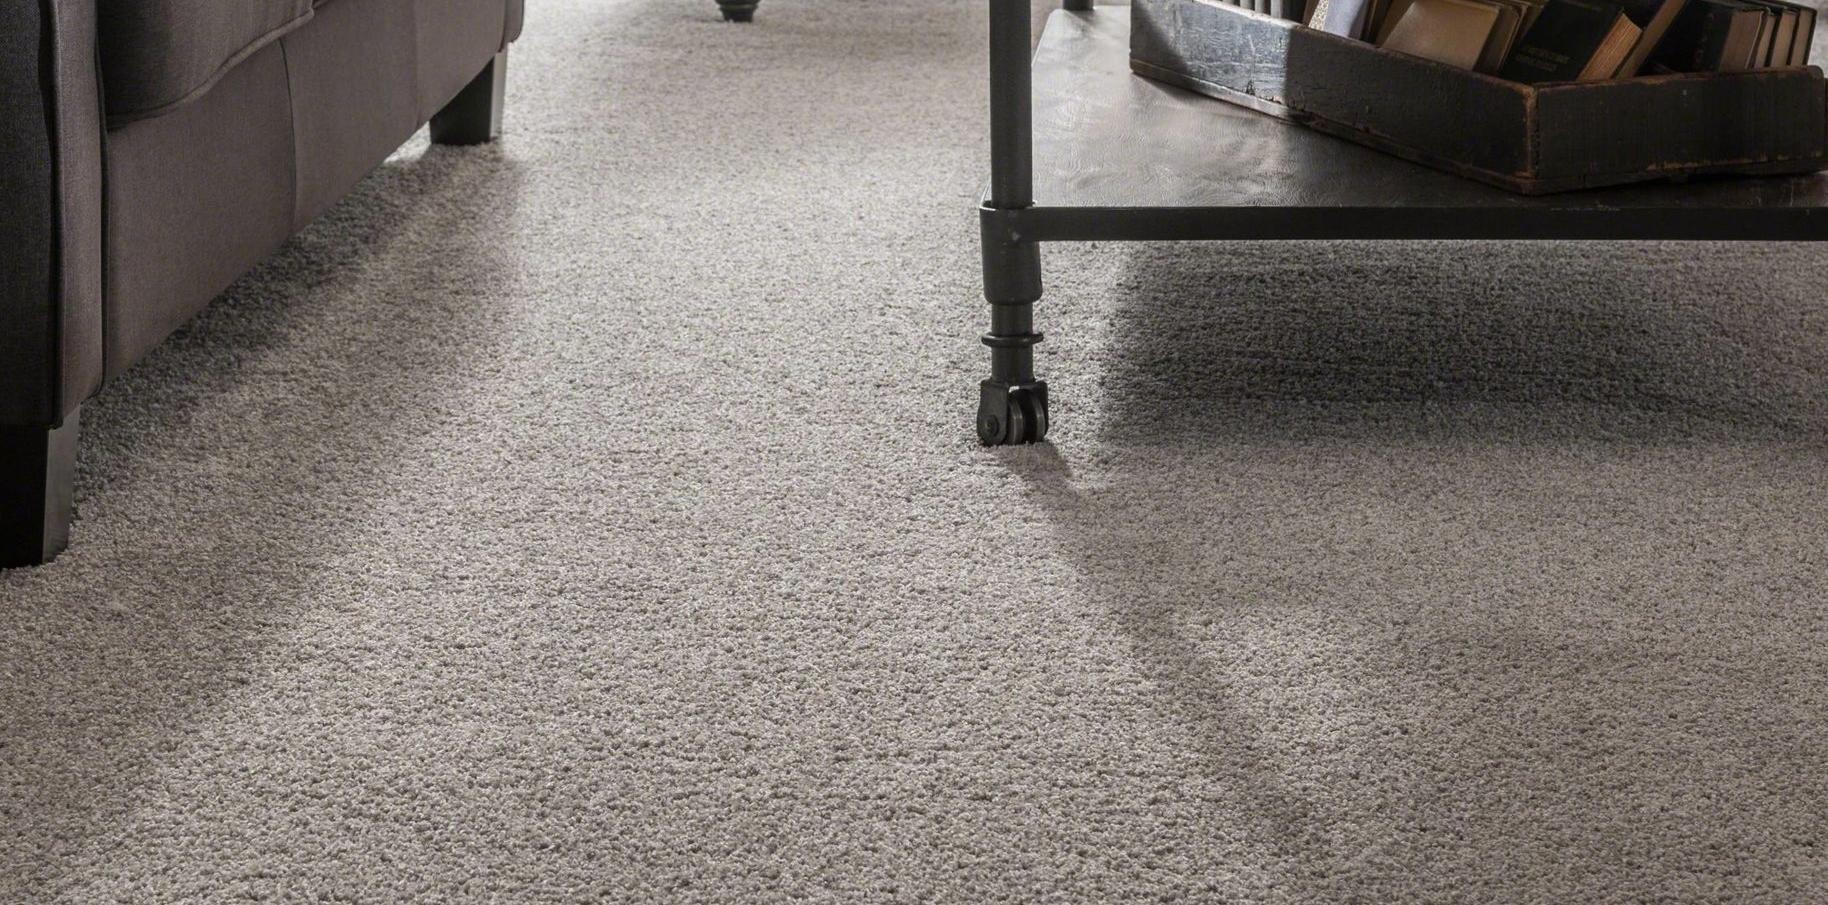 carpet 2 image.jpg